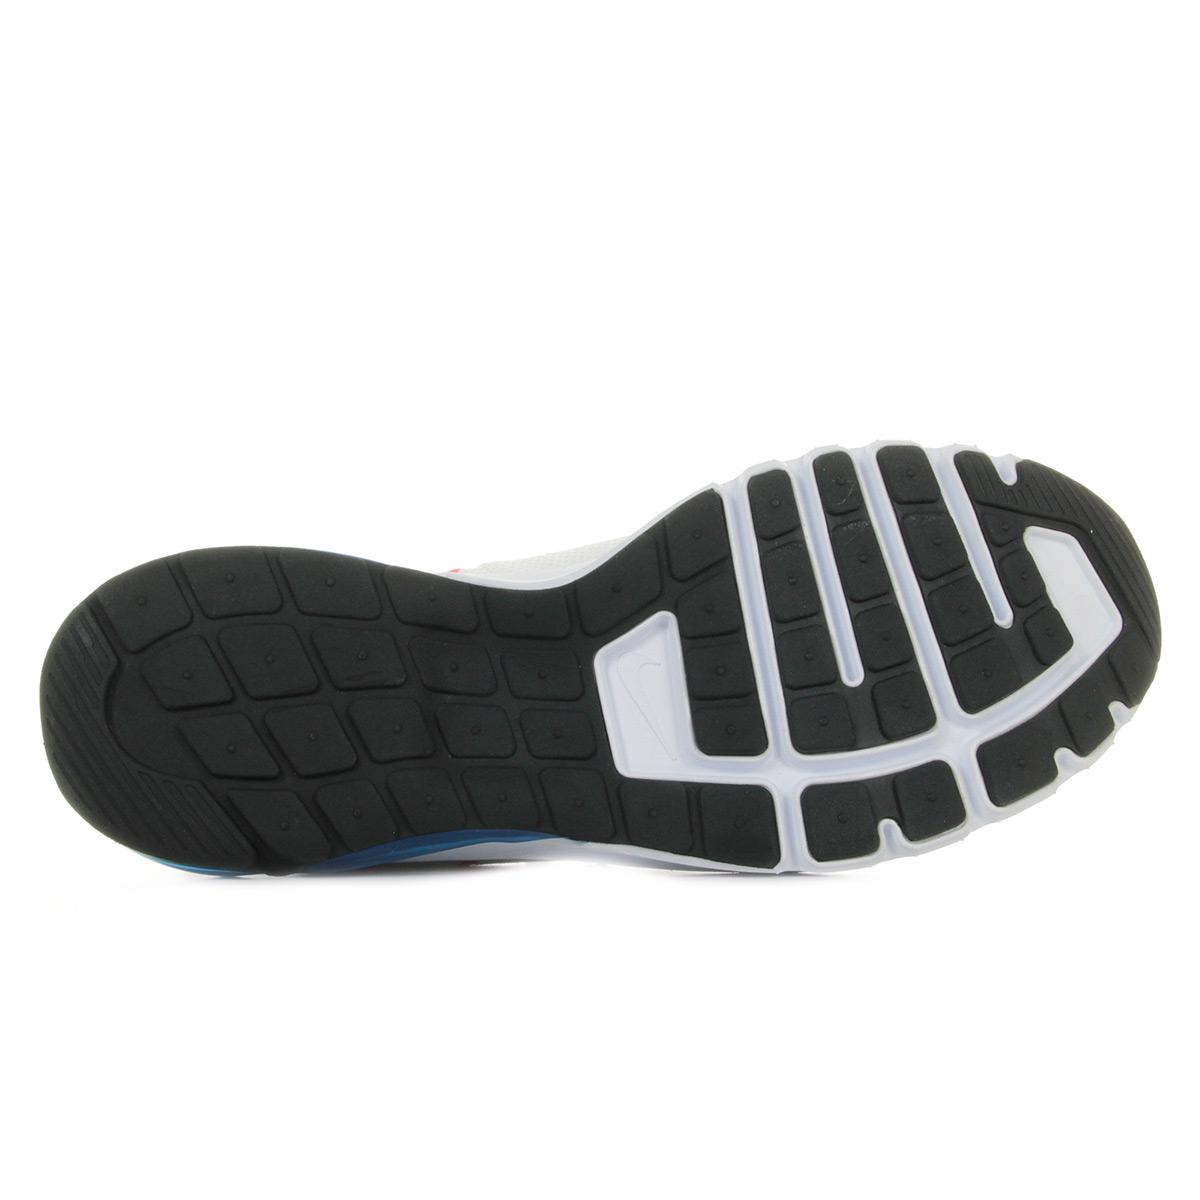 new product a78fe eaf6f ... Nike Air Max Flair 50